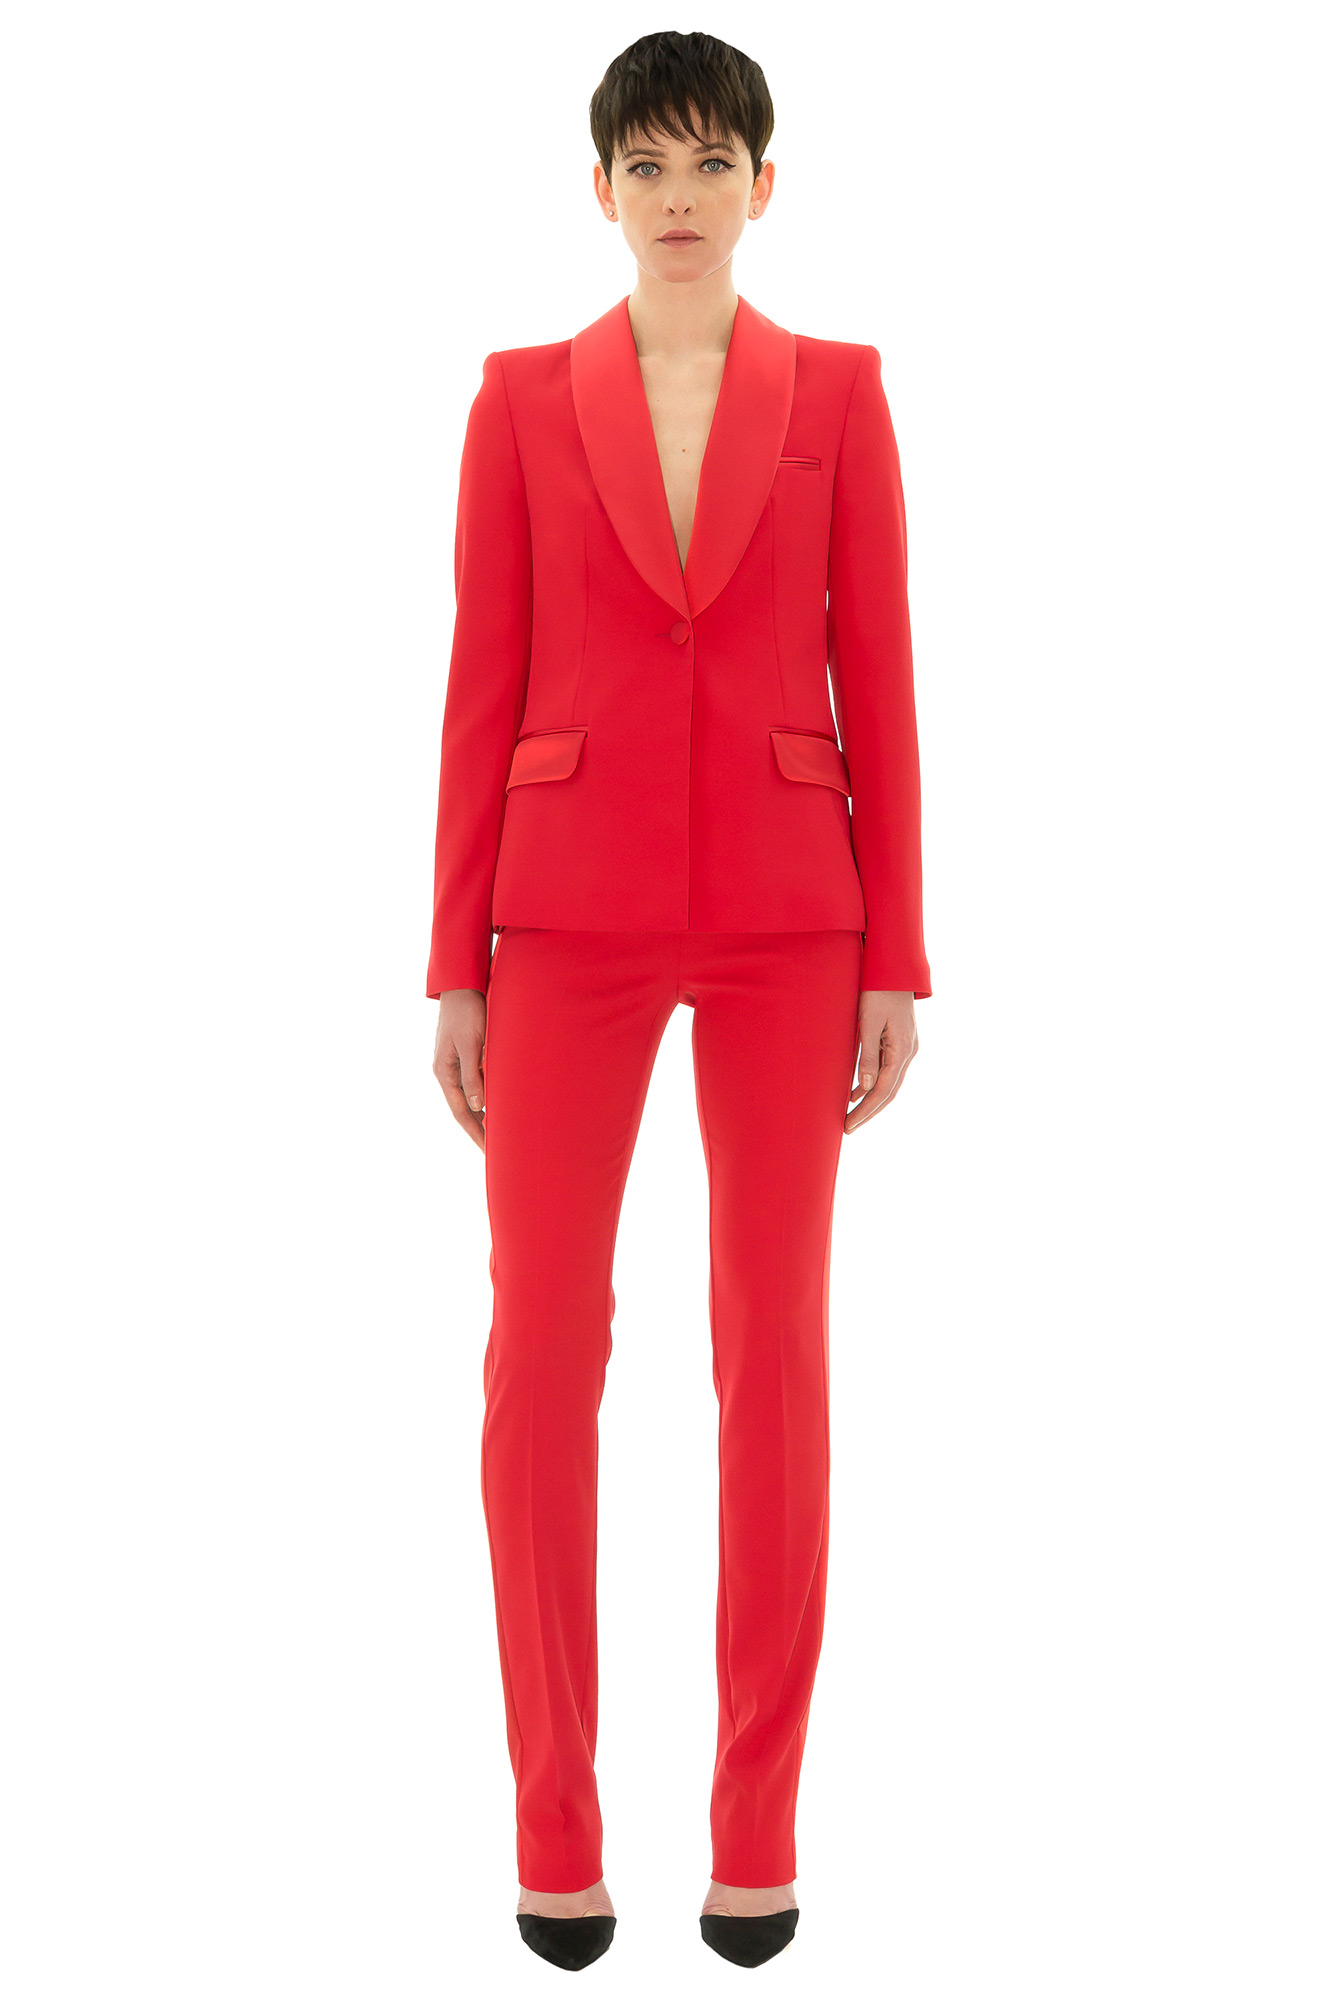 pantalon de smoking pantalon femme smoking rouge stefanie renoma. Black Bedroom Furniture Sets. Home Design Ideas